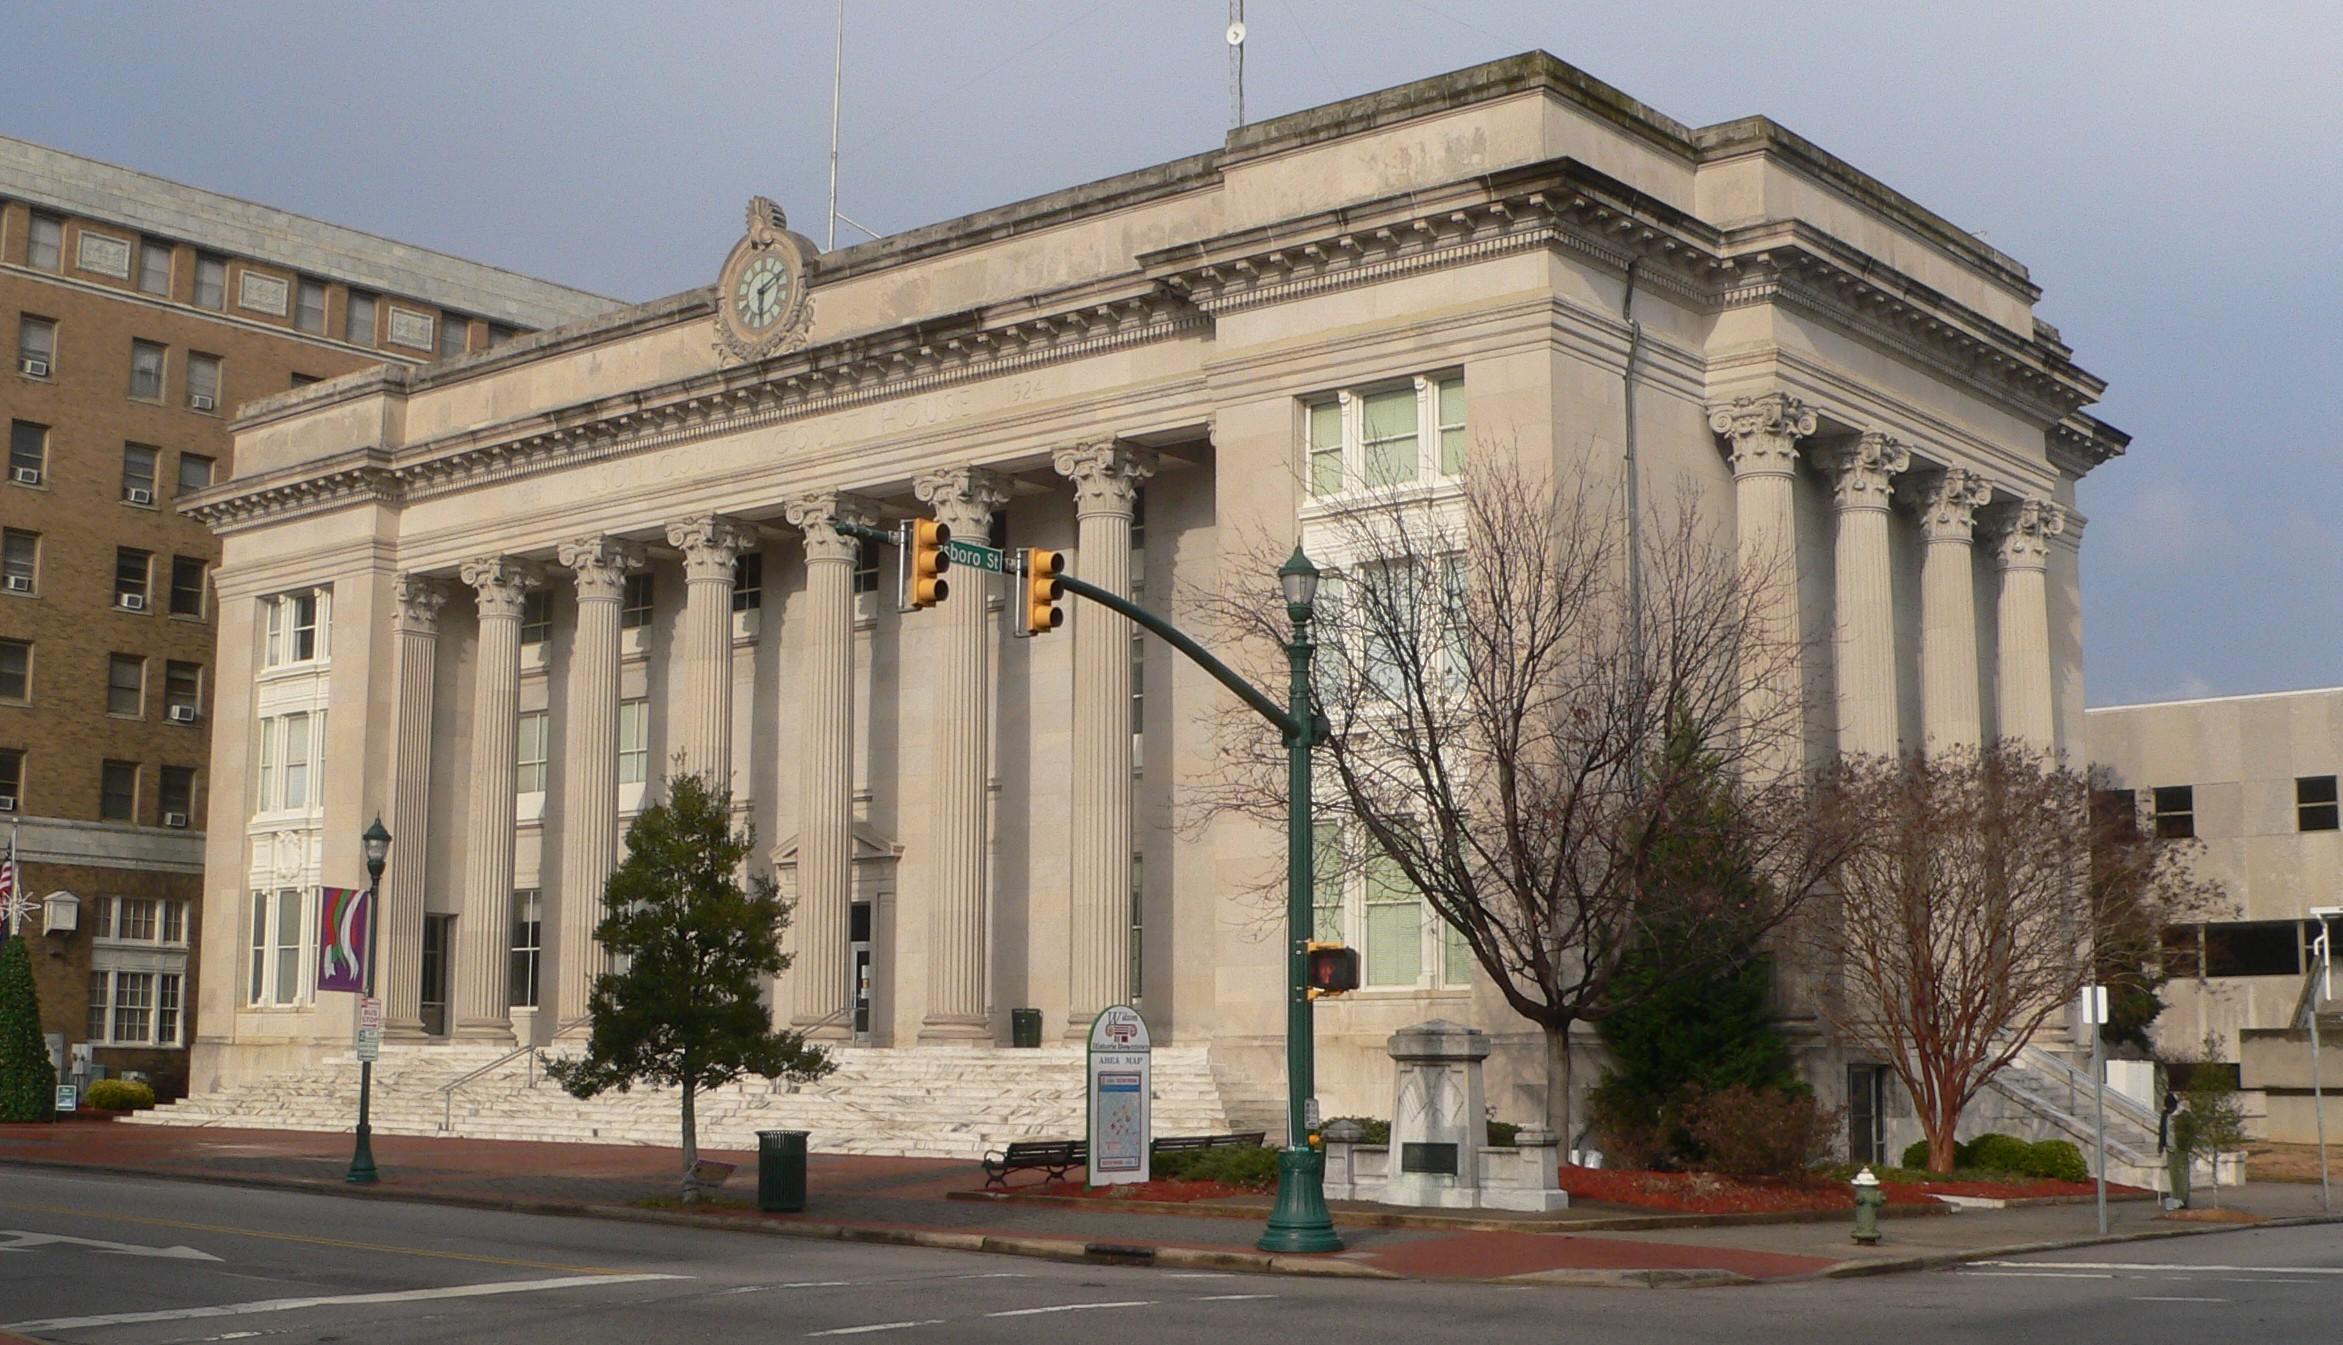 Wilson County Courthouse (Wilson, North Carolina)